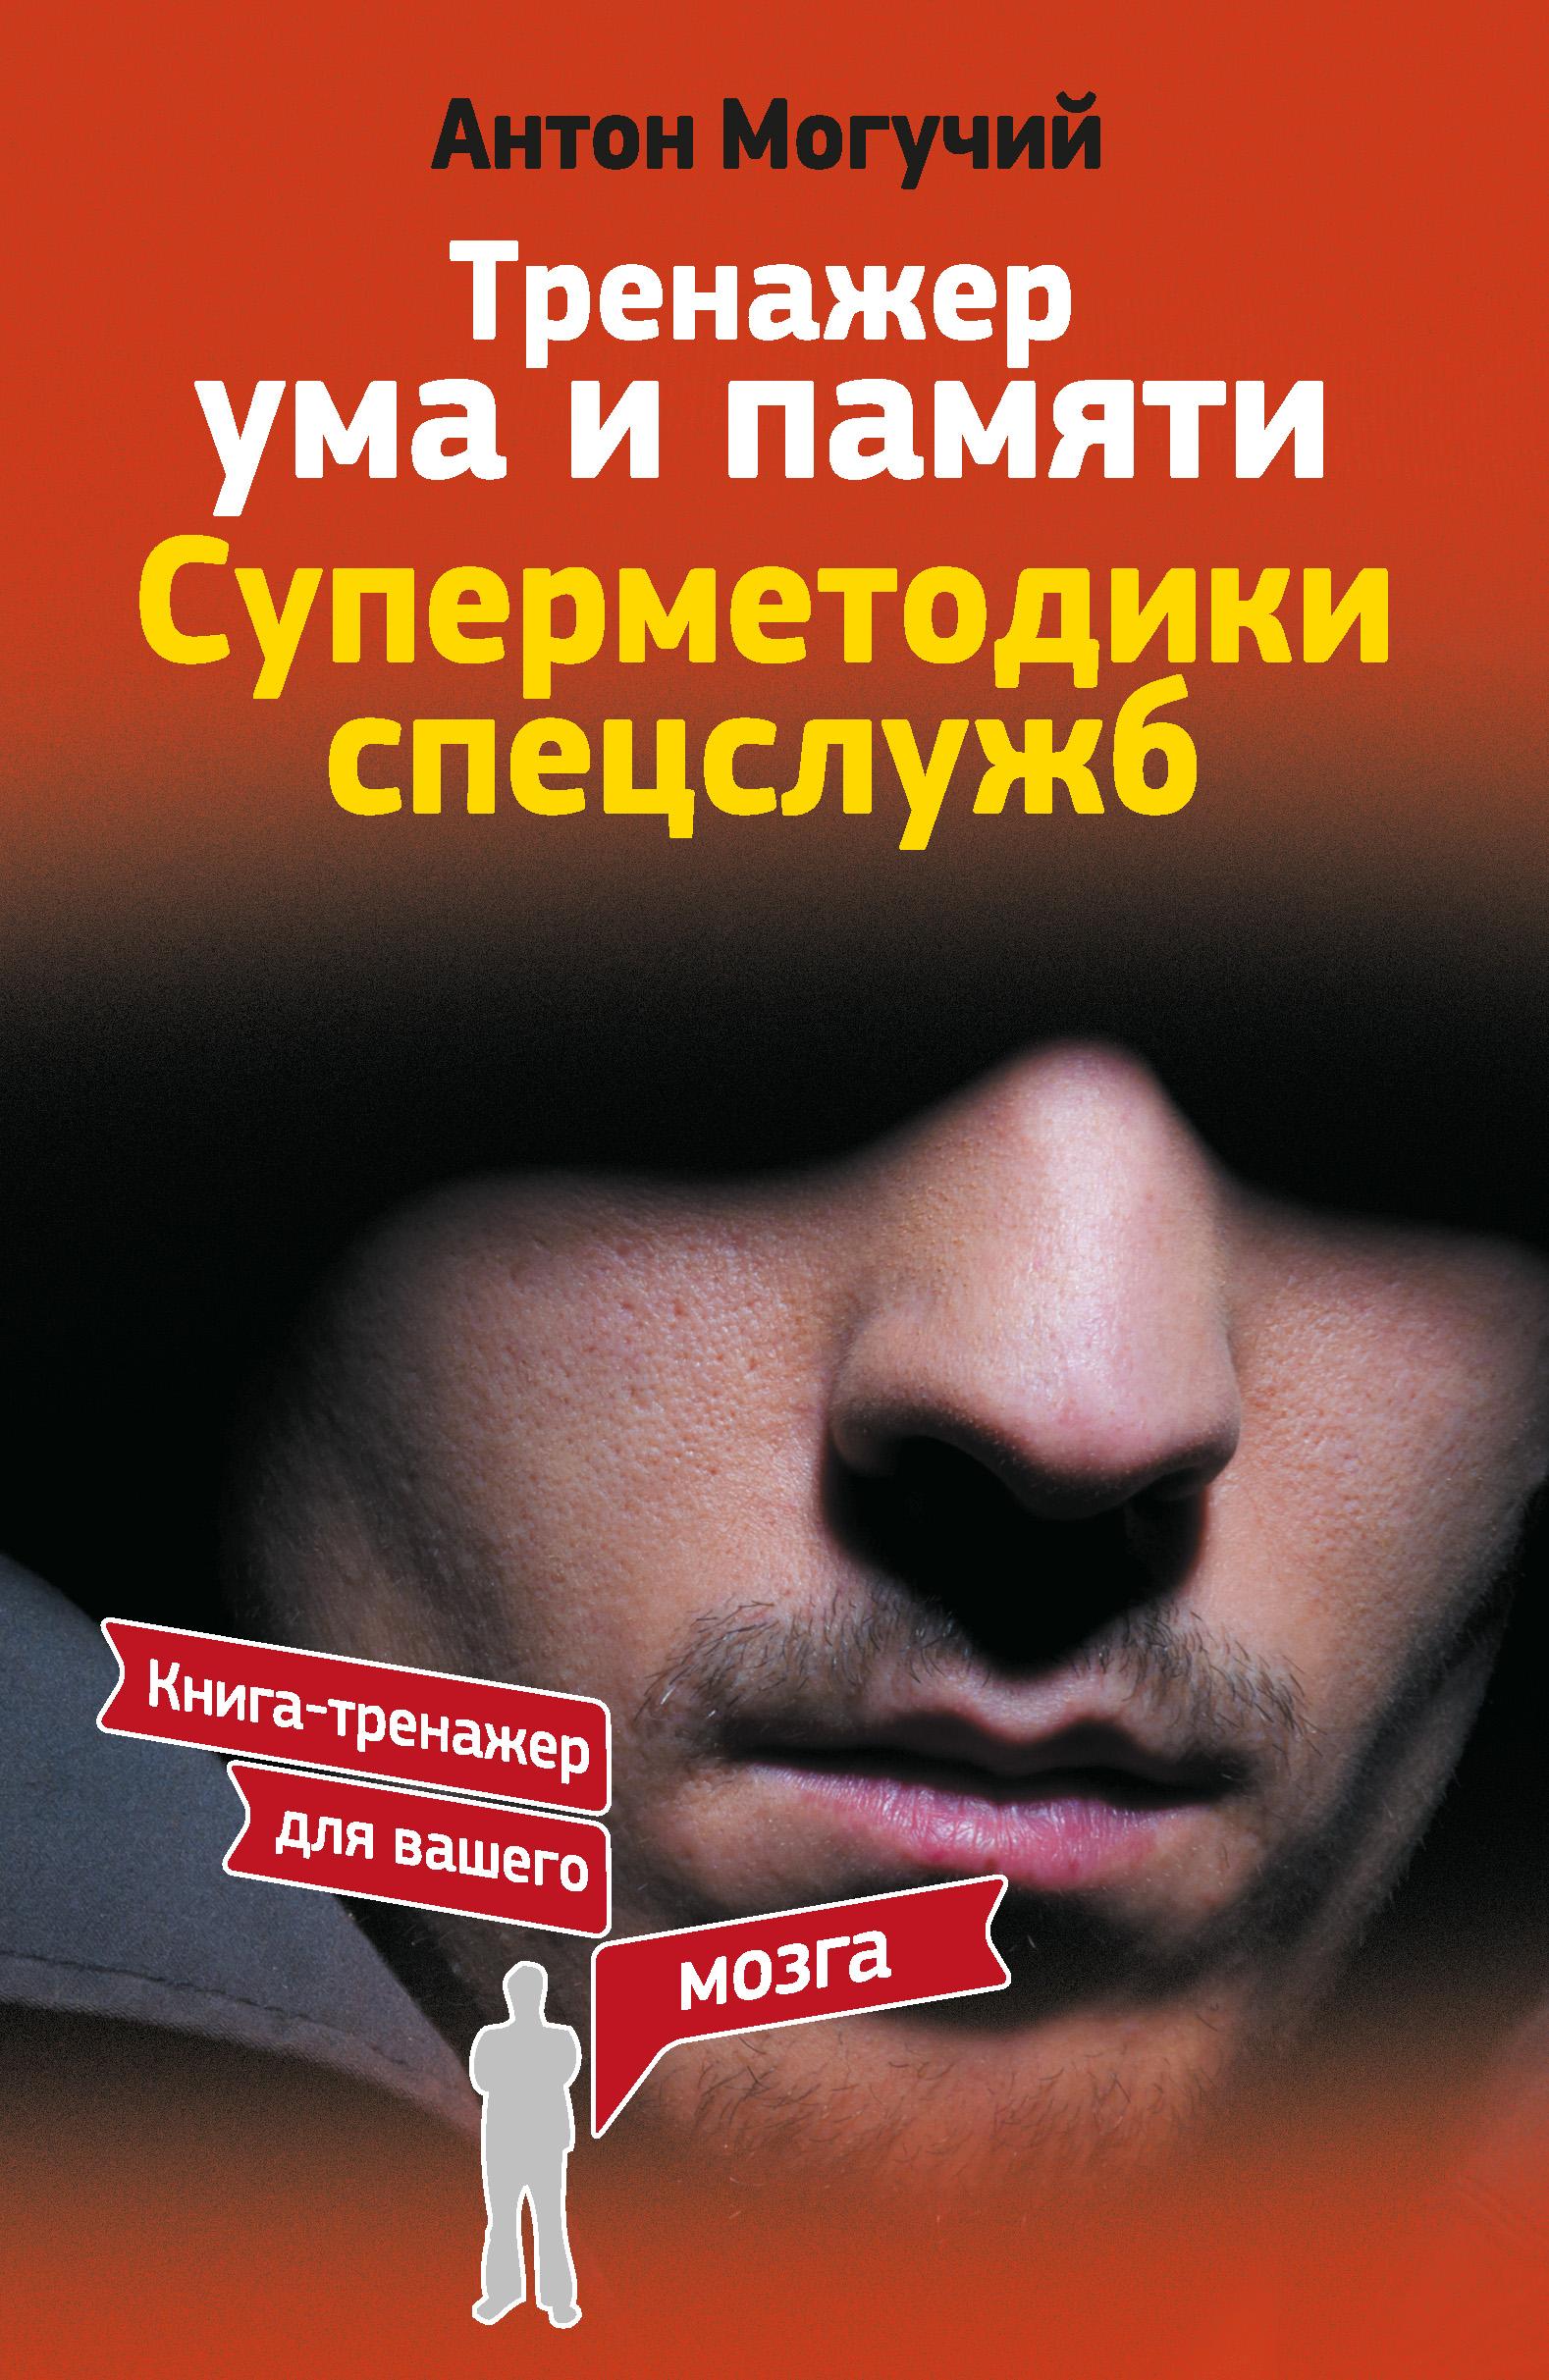 Антон Могучий «Тренажер ума и памяти. Суперметодики спецслужб»